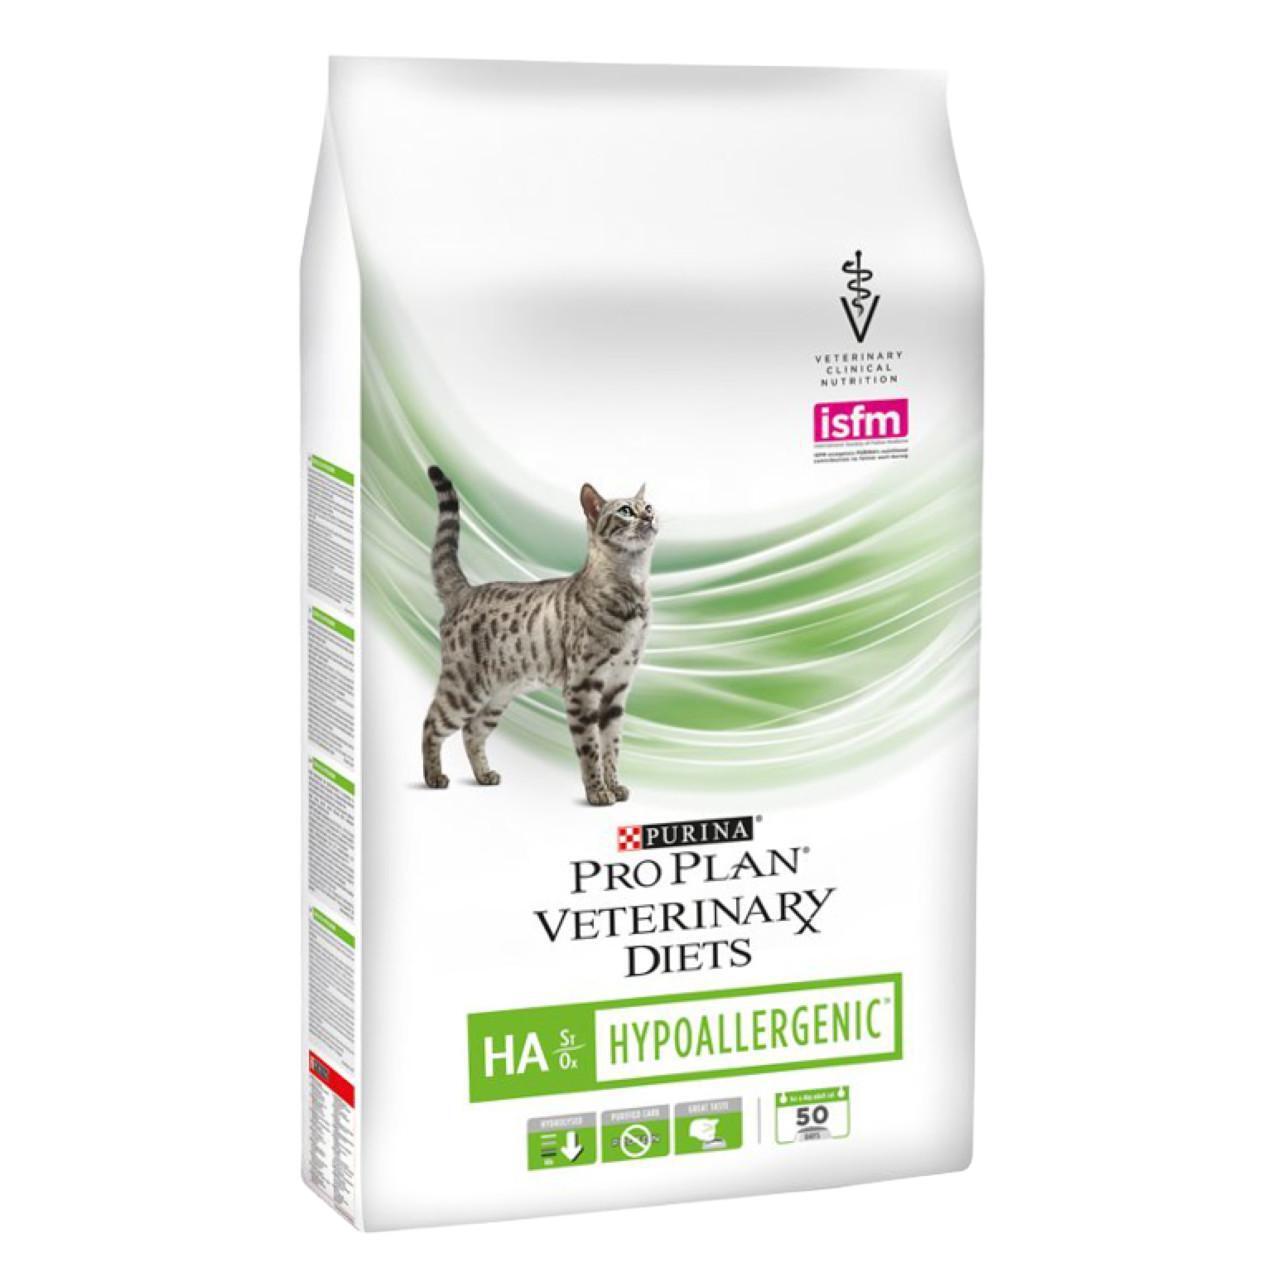 Pro Plan Veterinary Diets Hypoallergenic при аллергических реакциях, уп.1,3 кг